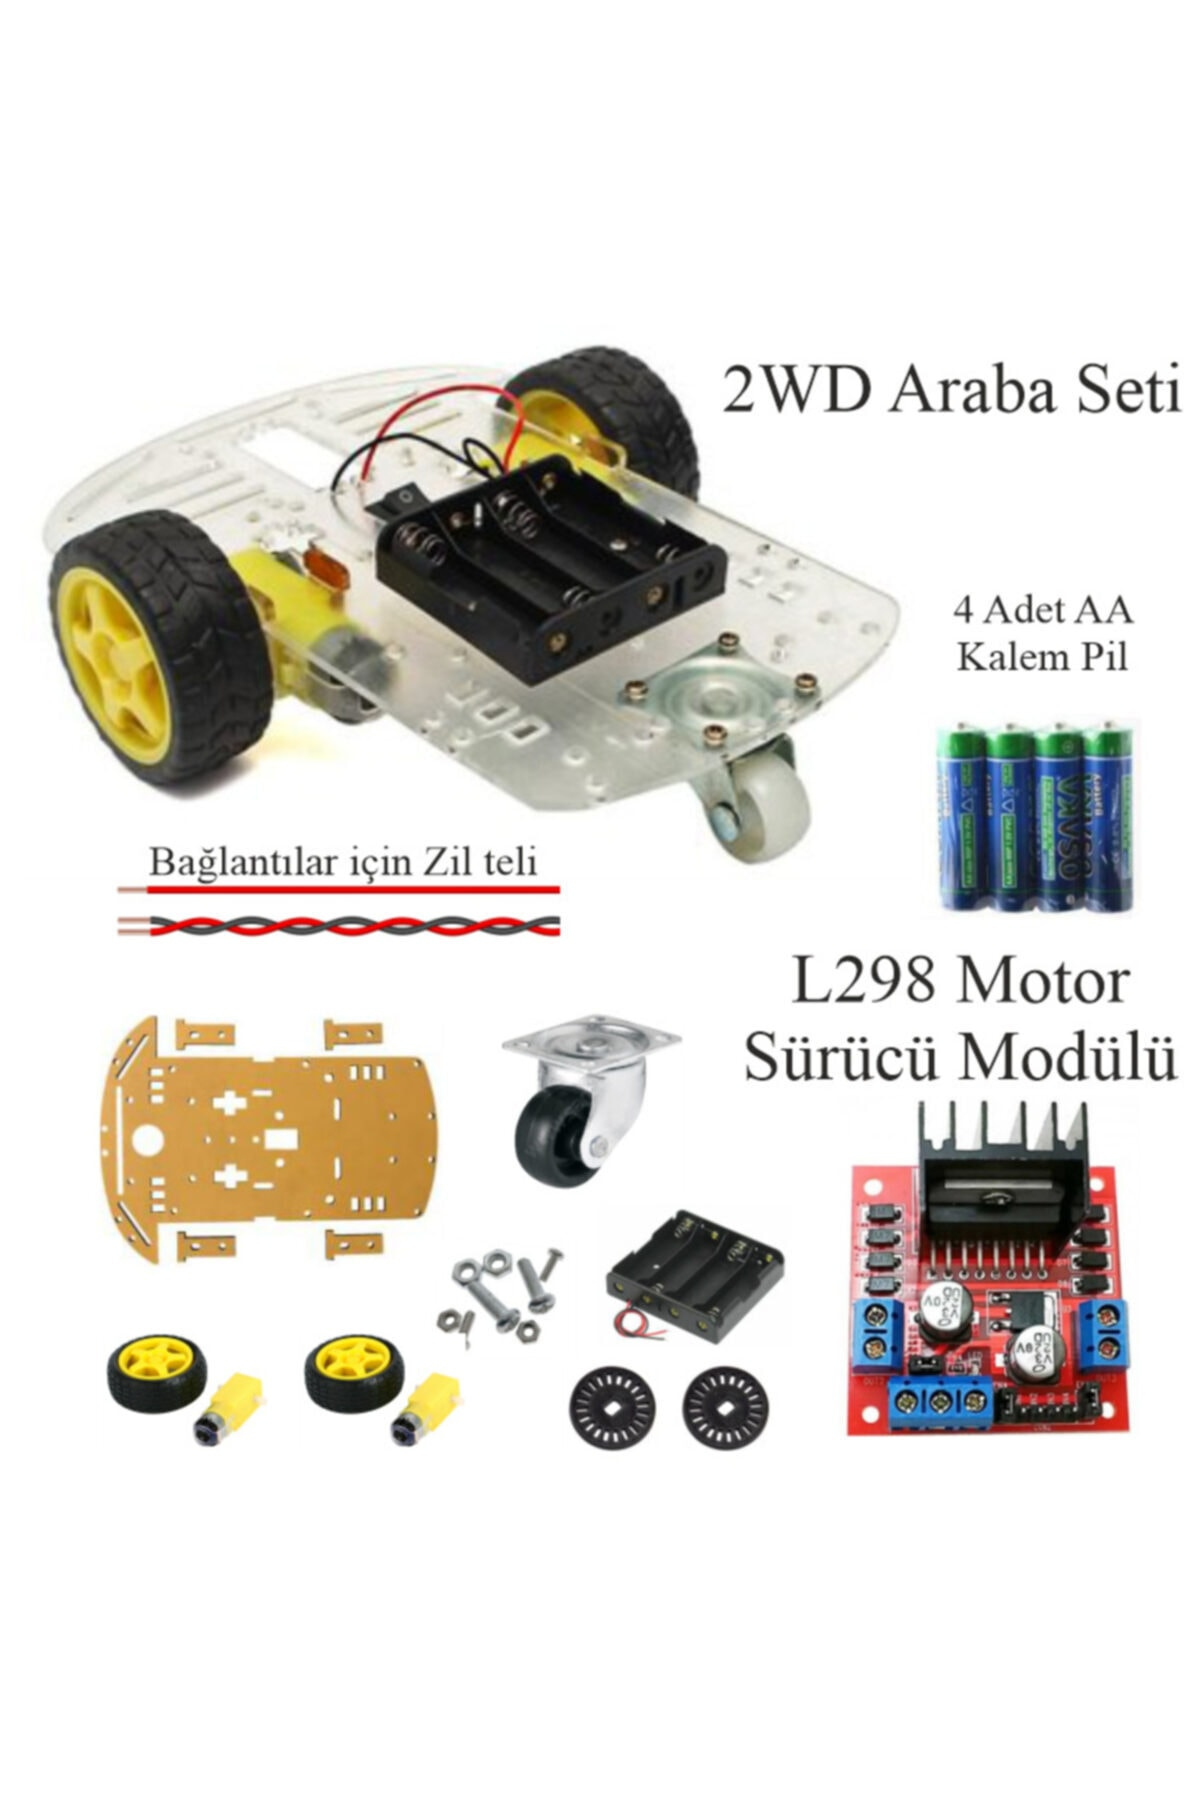 Prototip Arduino Başlangıç Seti Uno R3 ( Dıp Model ) 105 Parça 327 Adet 2